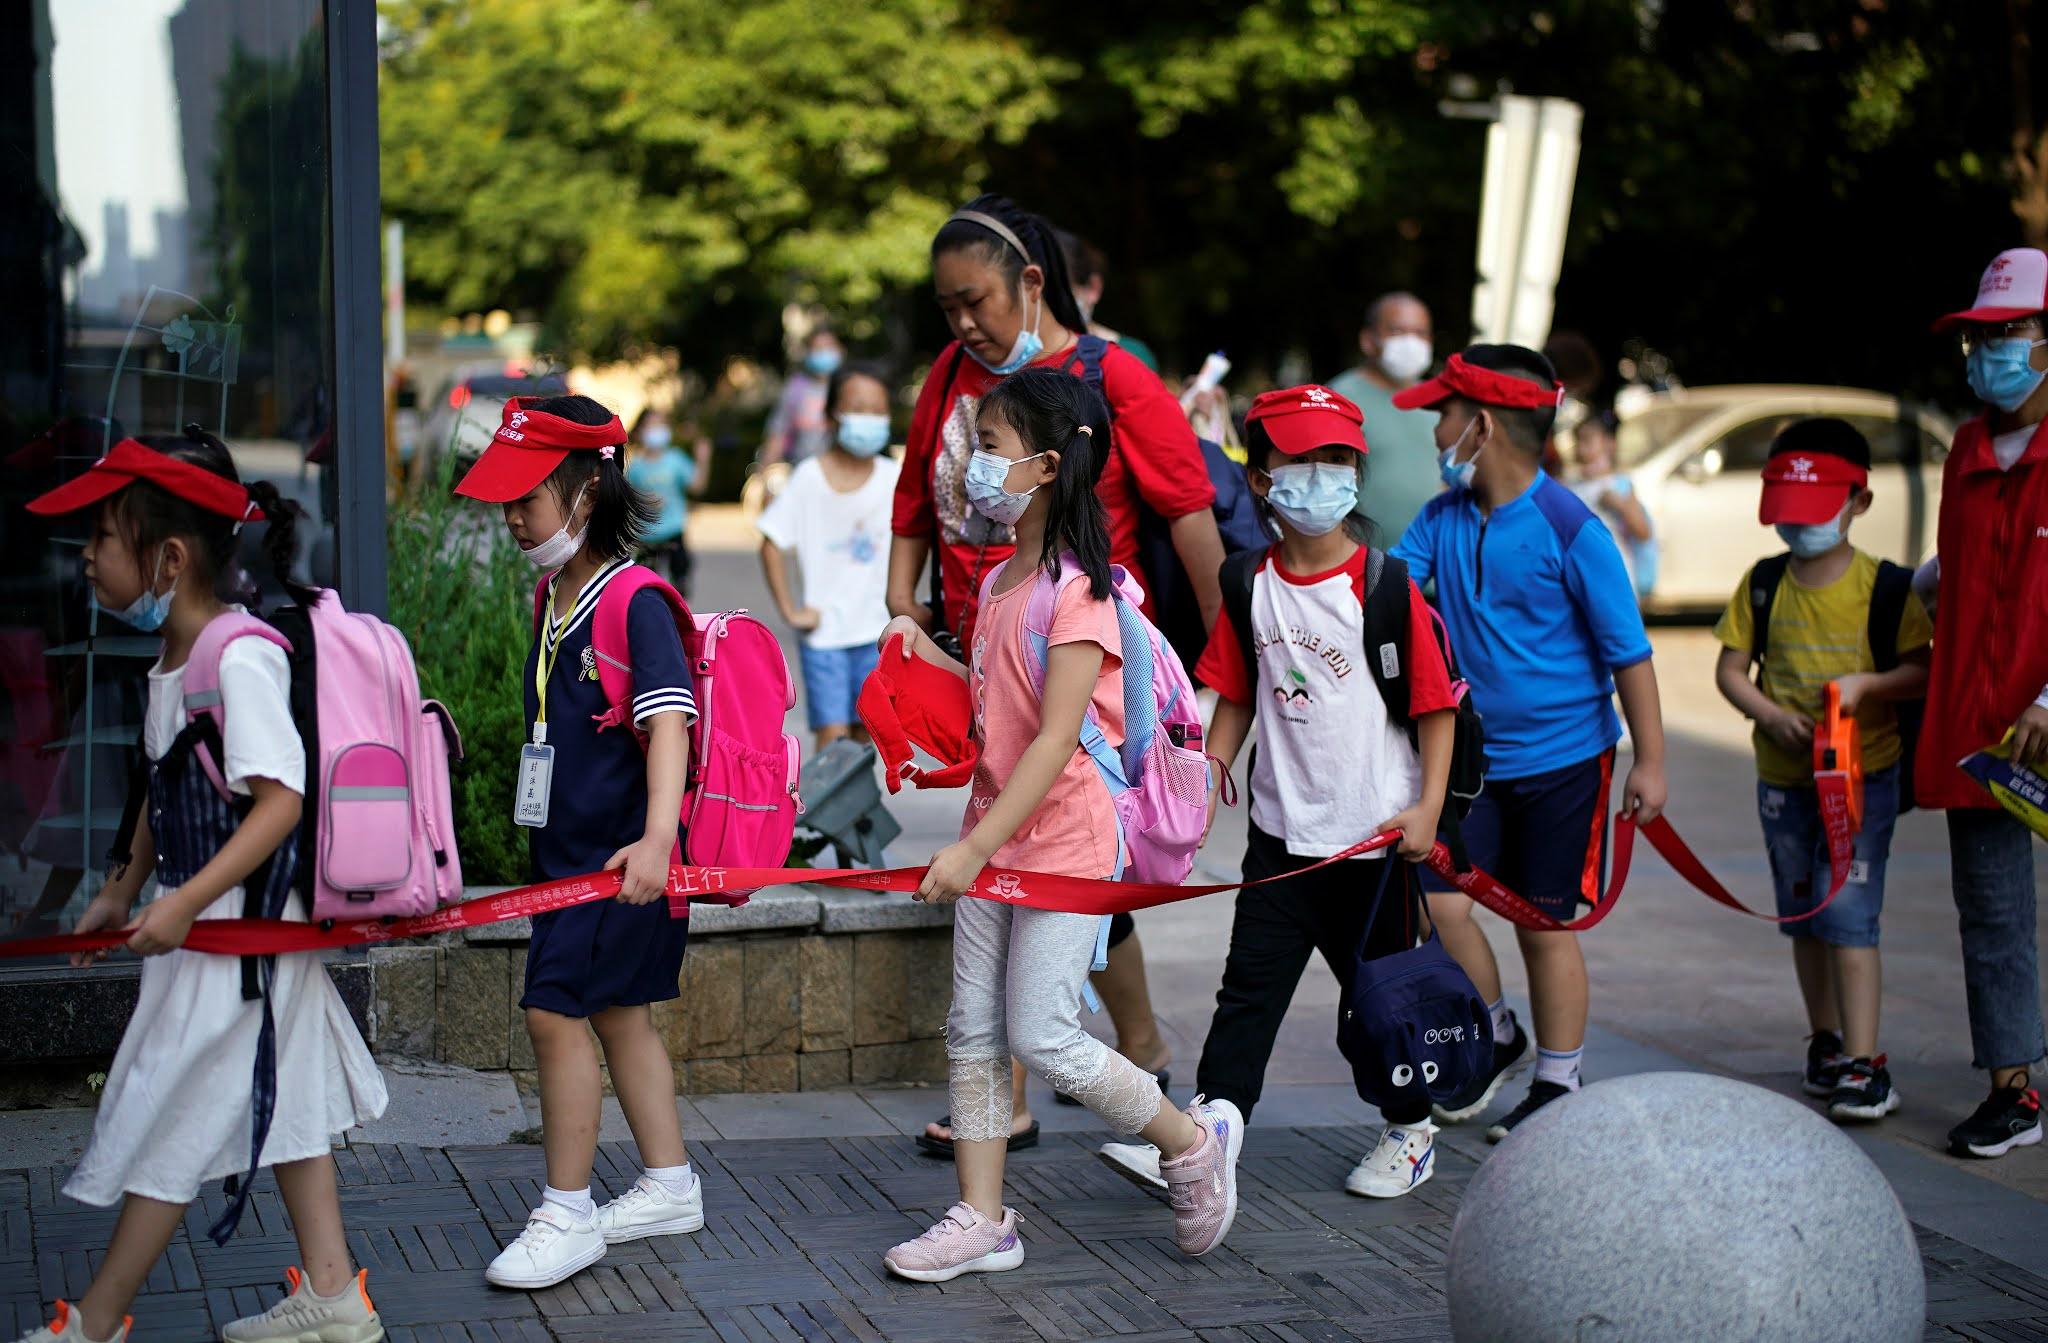 China Rancang Aturan Baru Untuk Lembaga Pendidikan Swasta